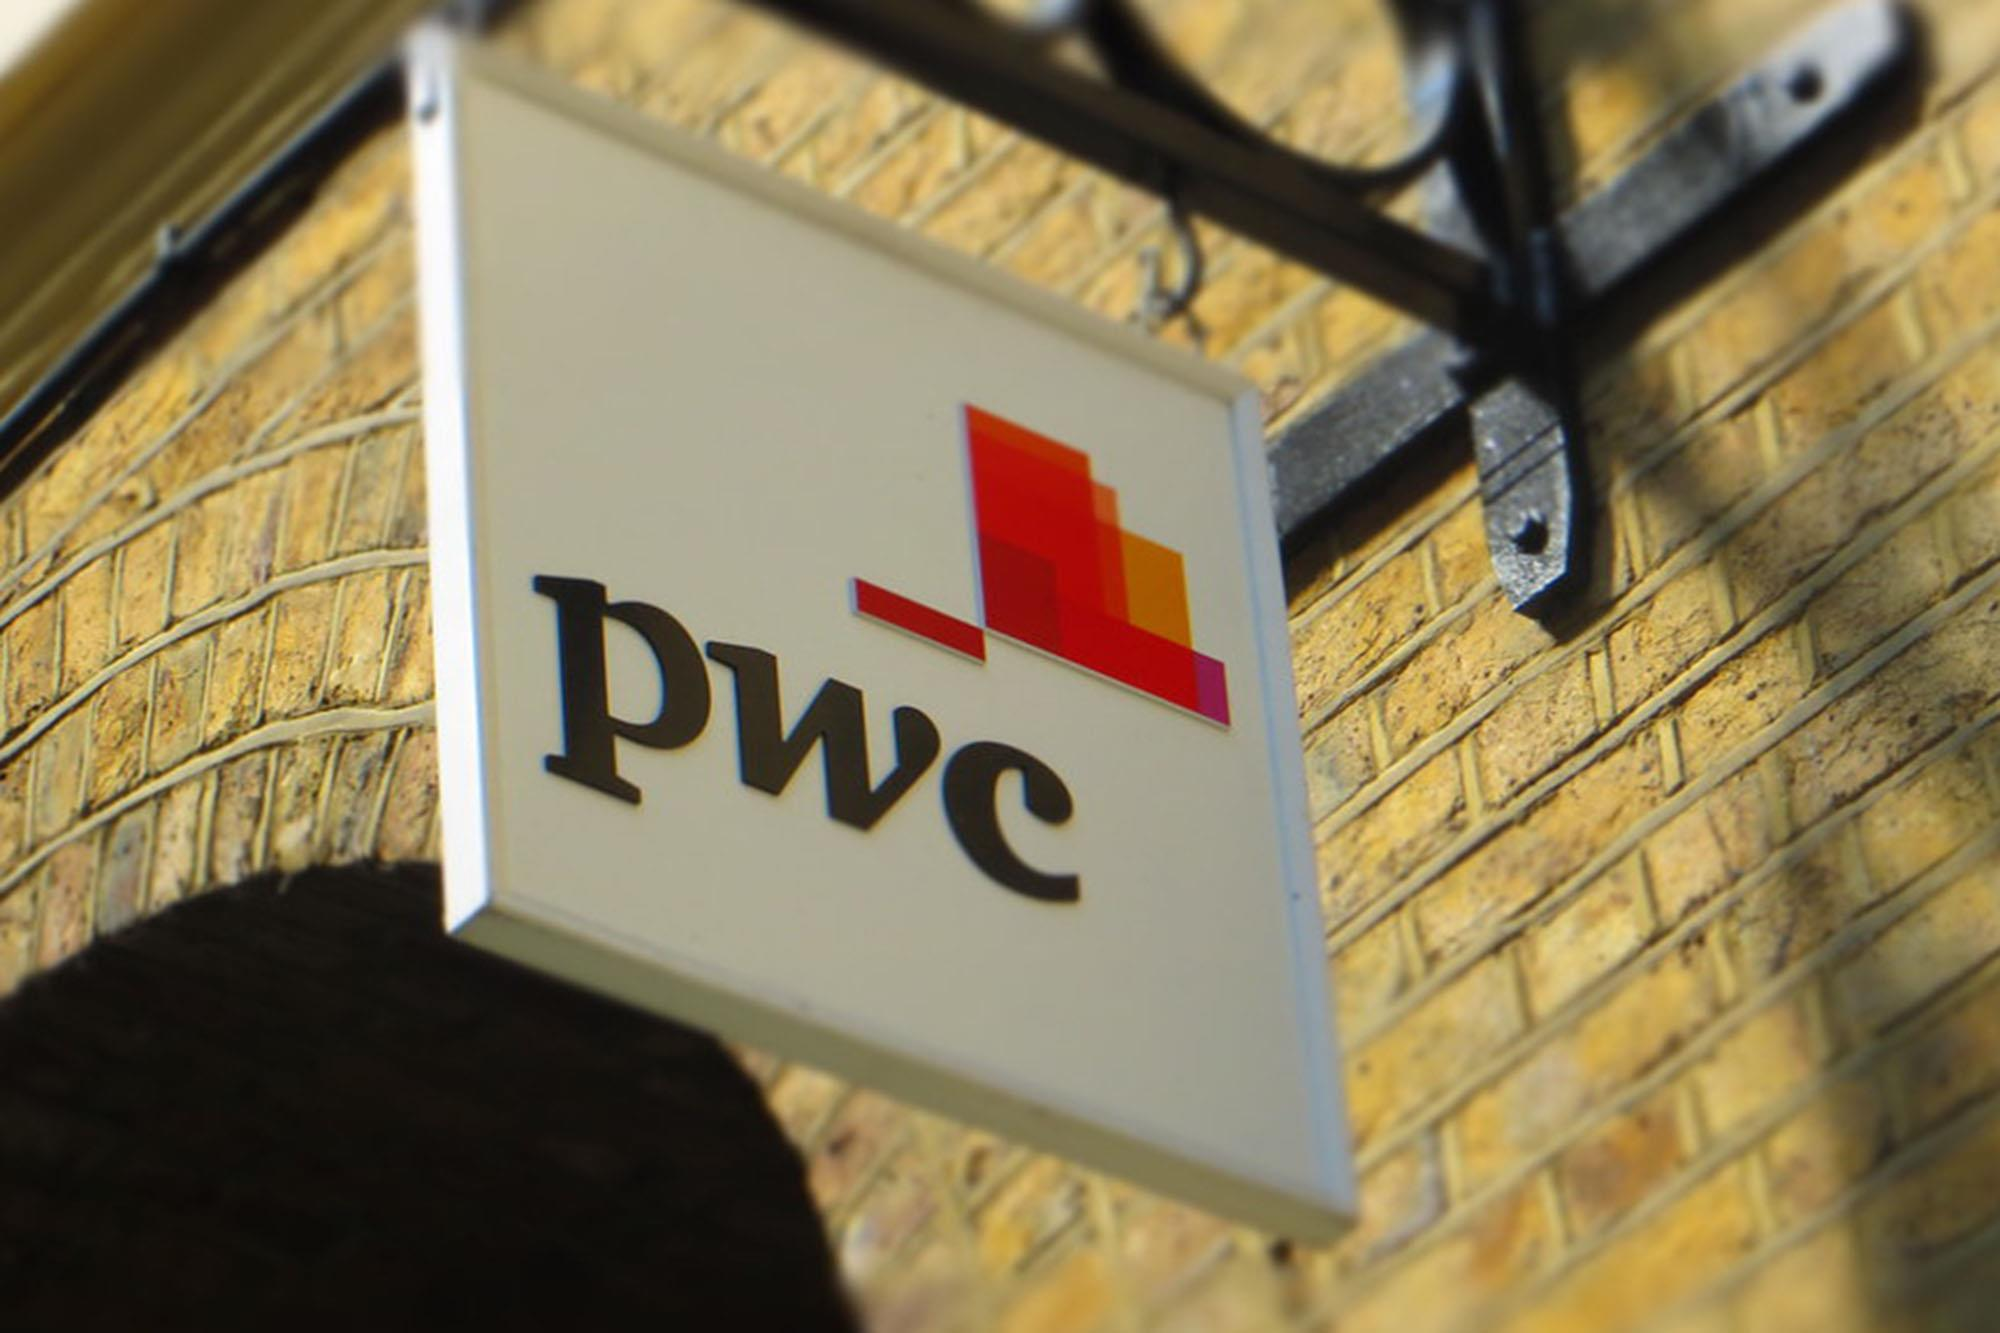 Sealed Air dumps EY & hires PwC, as SEC investigates